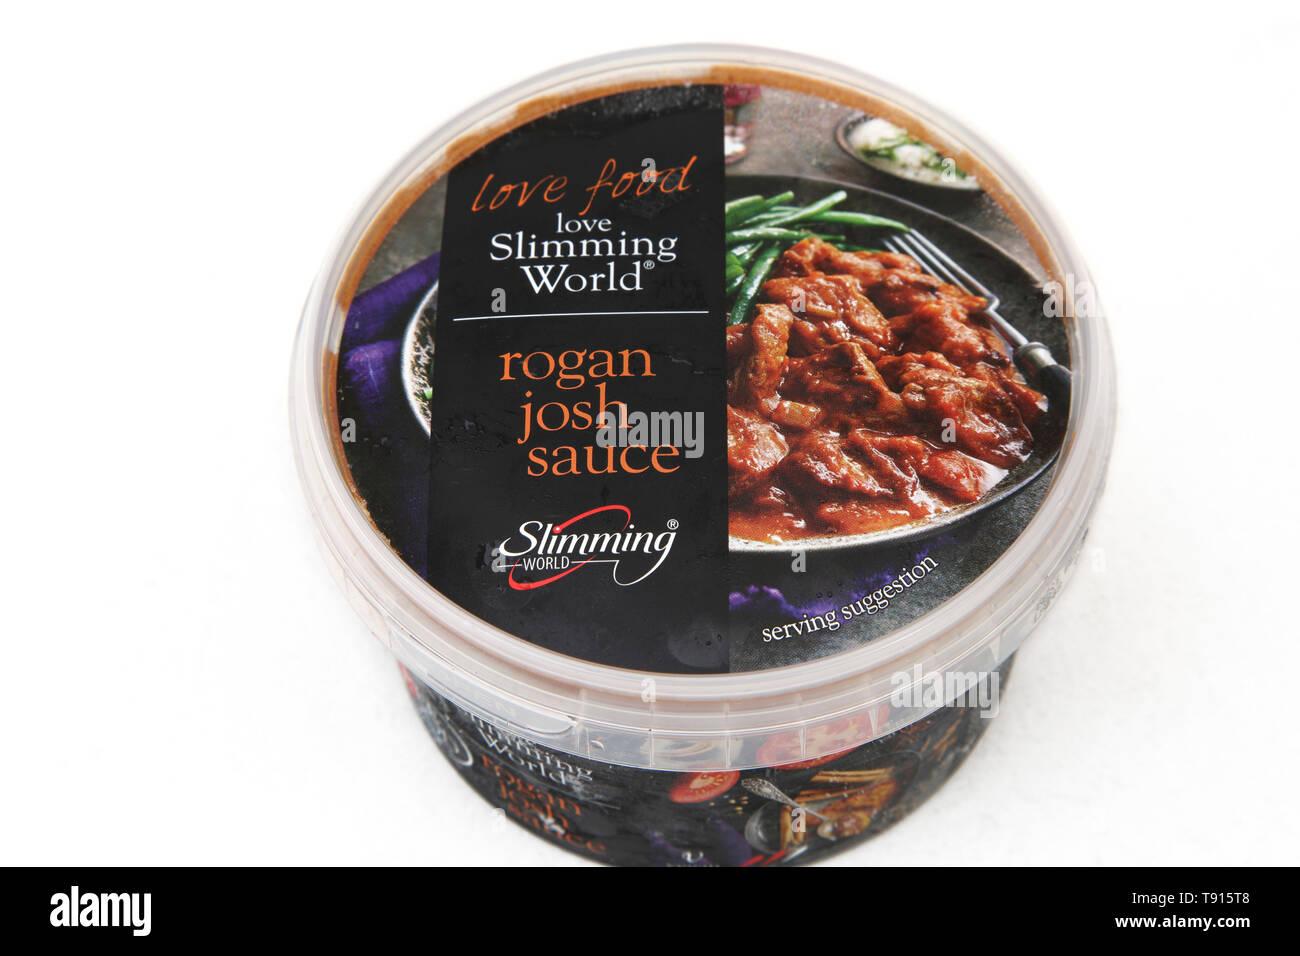 Slimming World Vegan Curry Rogan Josh Sauce - Stock Image